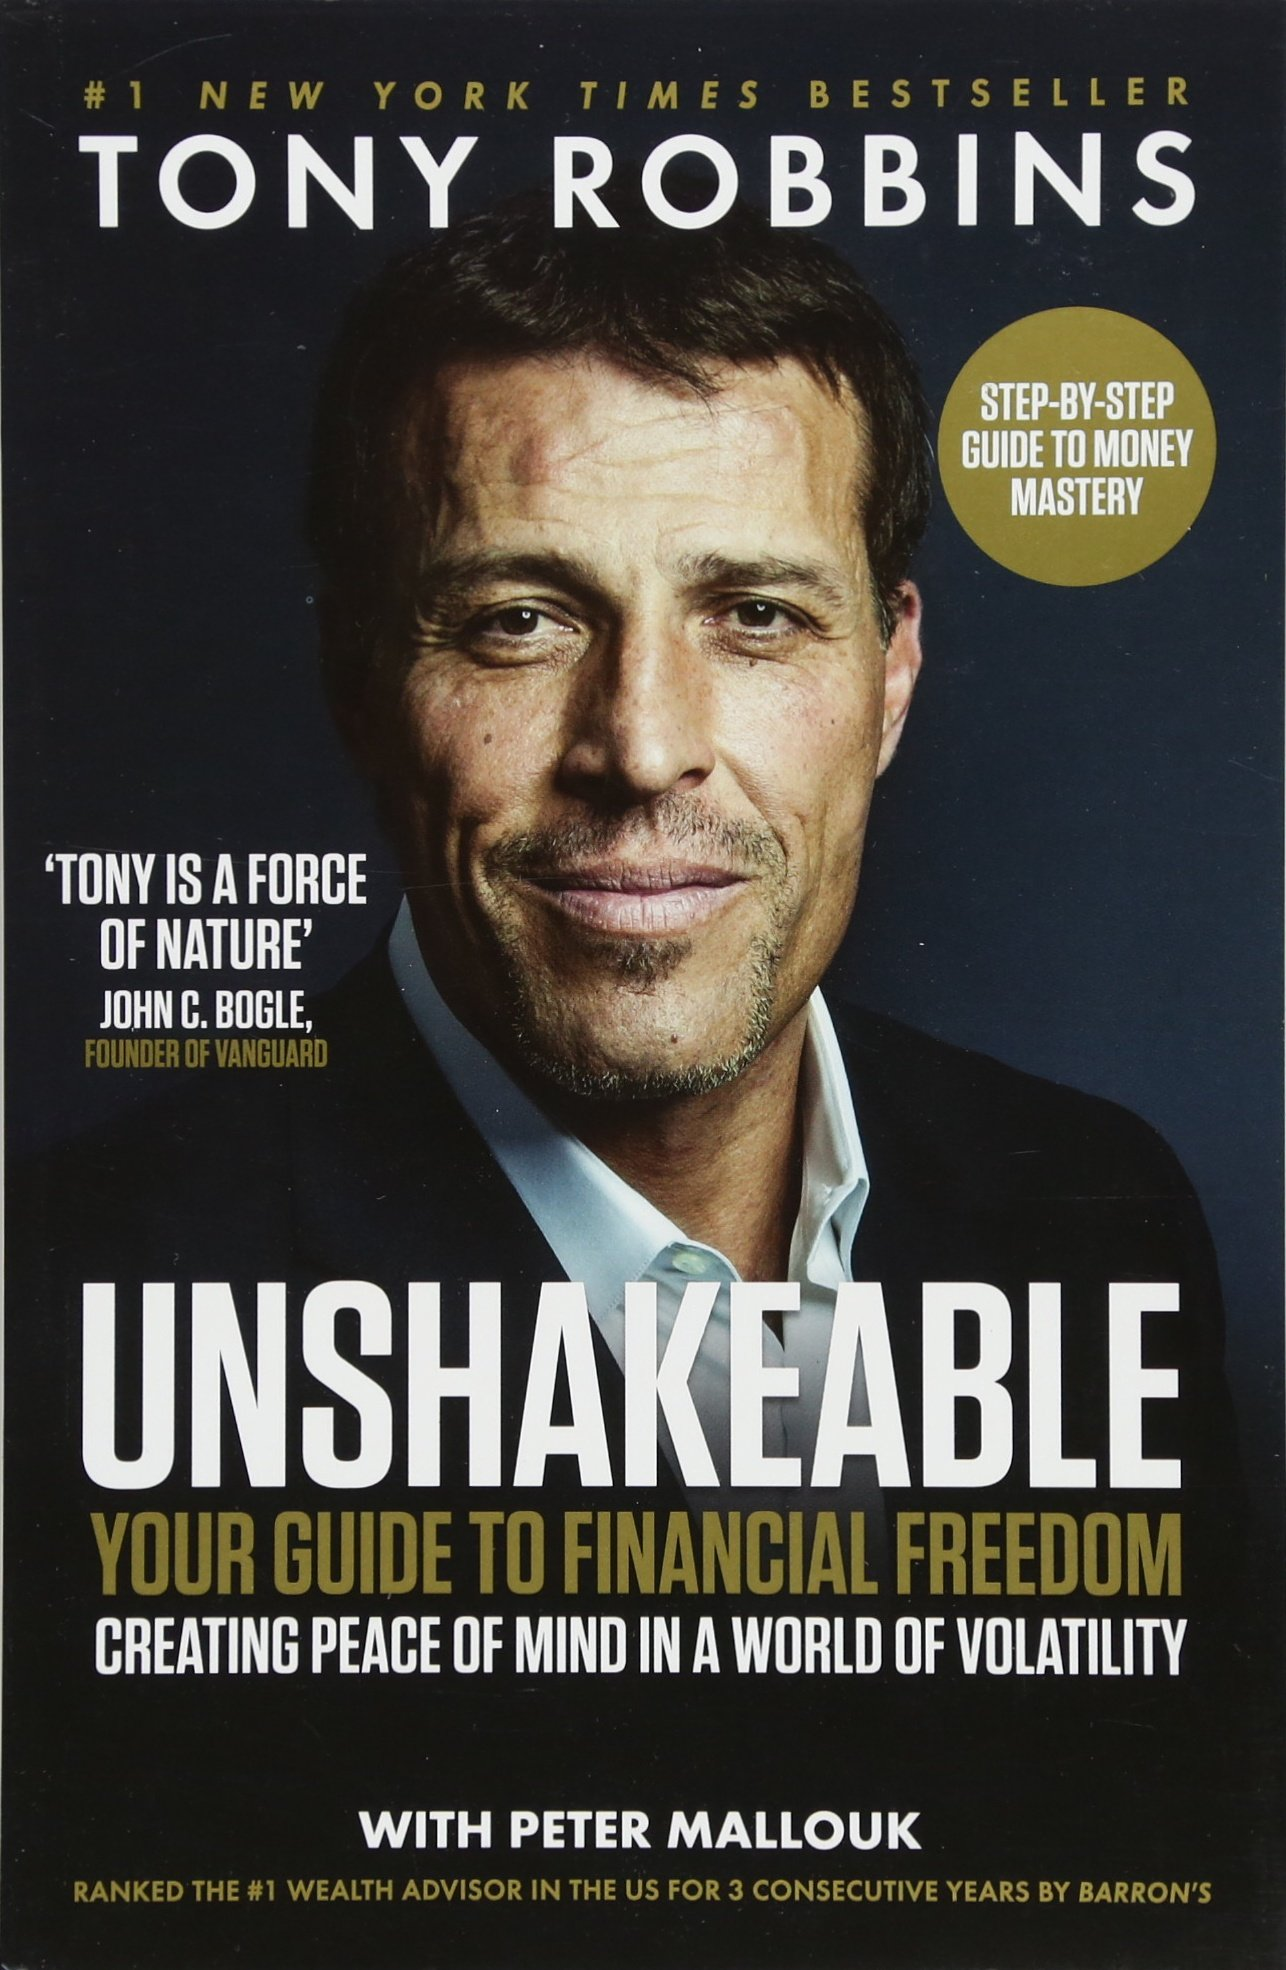 Unshakeable Tony Robbins The Humble Penny